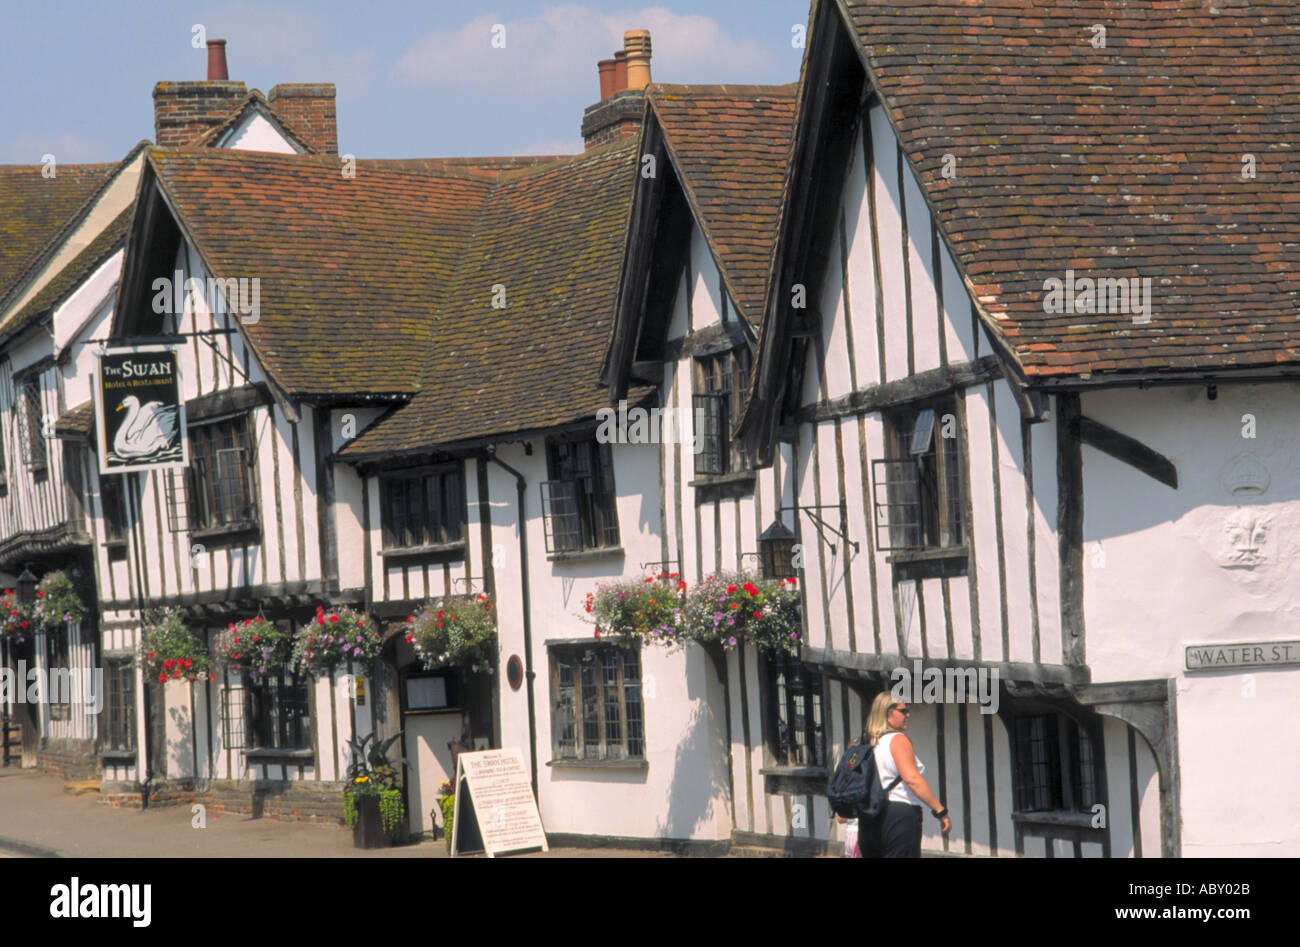 The Swan Hotel High Street Lavenham Suffolk England Stock Photo